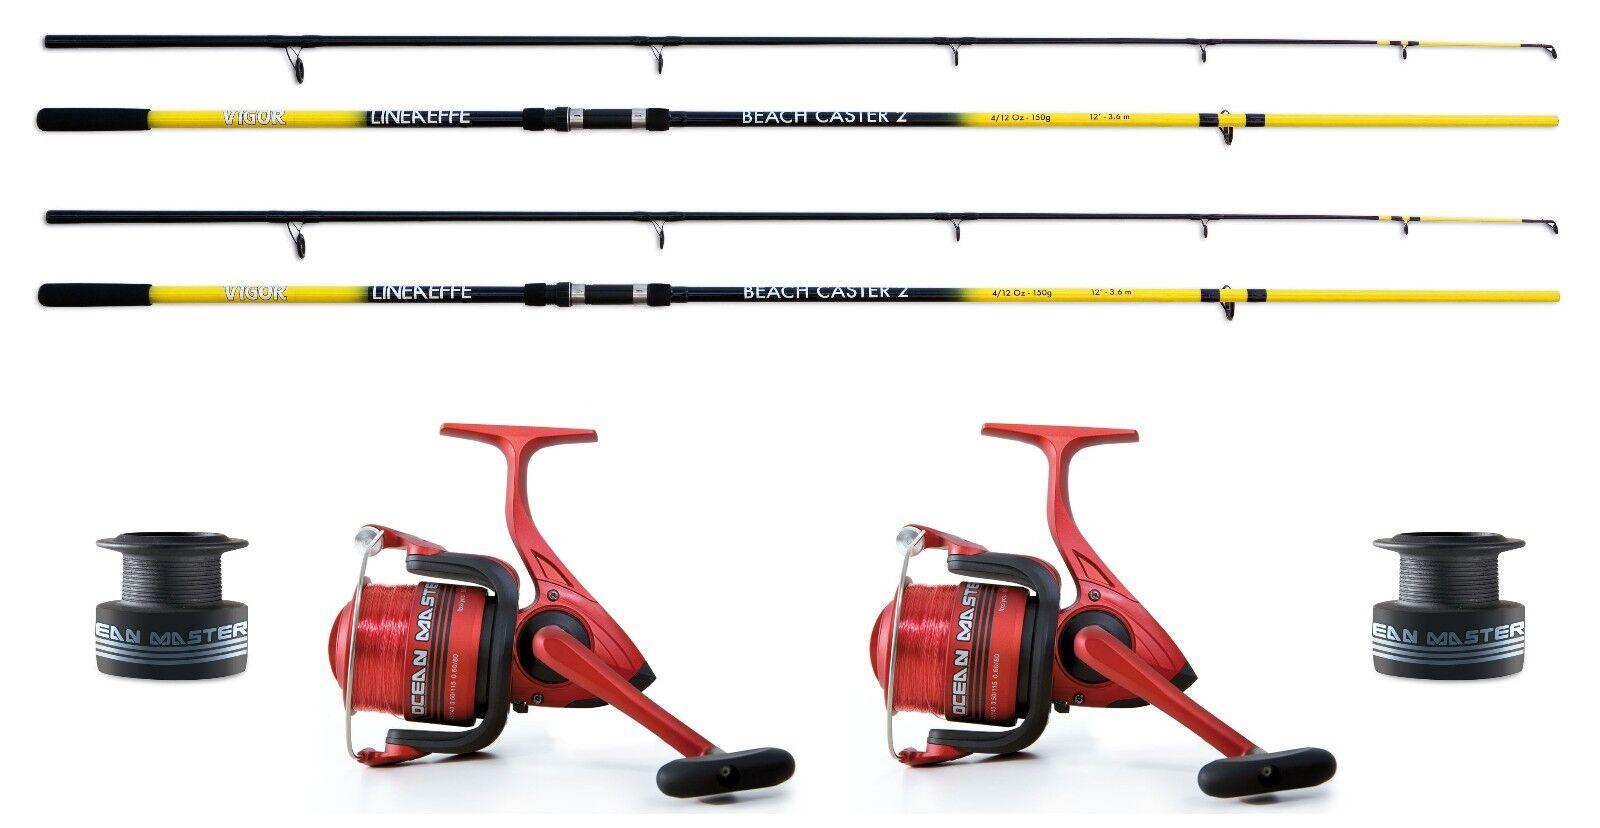 2 Vigor 12ft Beachcaster rods & 2 Ocean master 70FD Reels + line Sea fishing